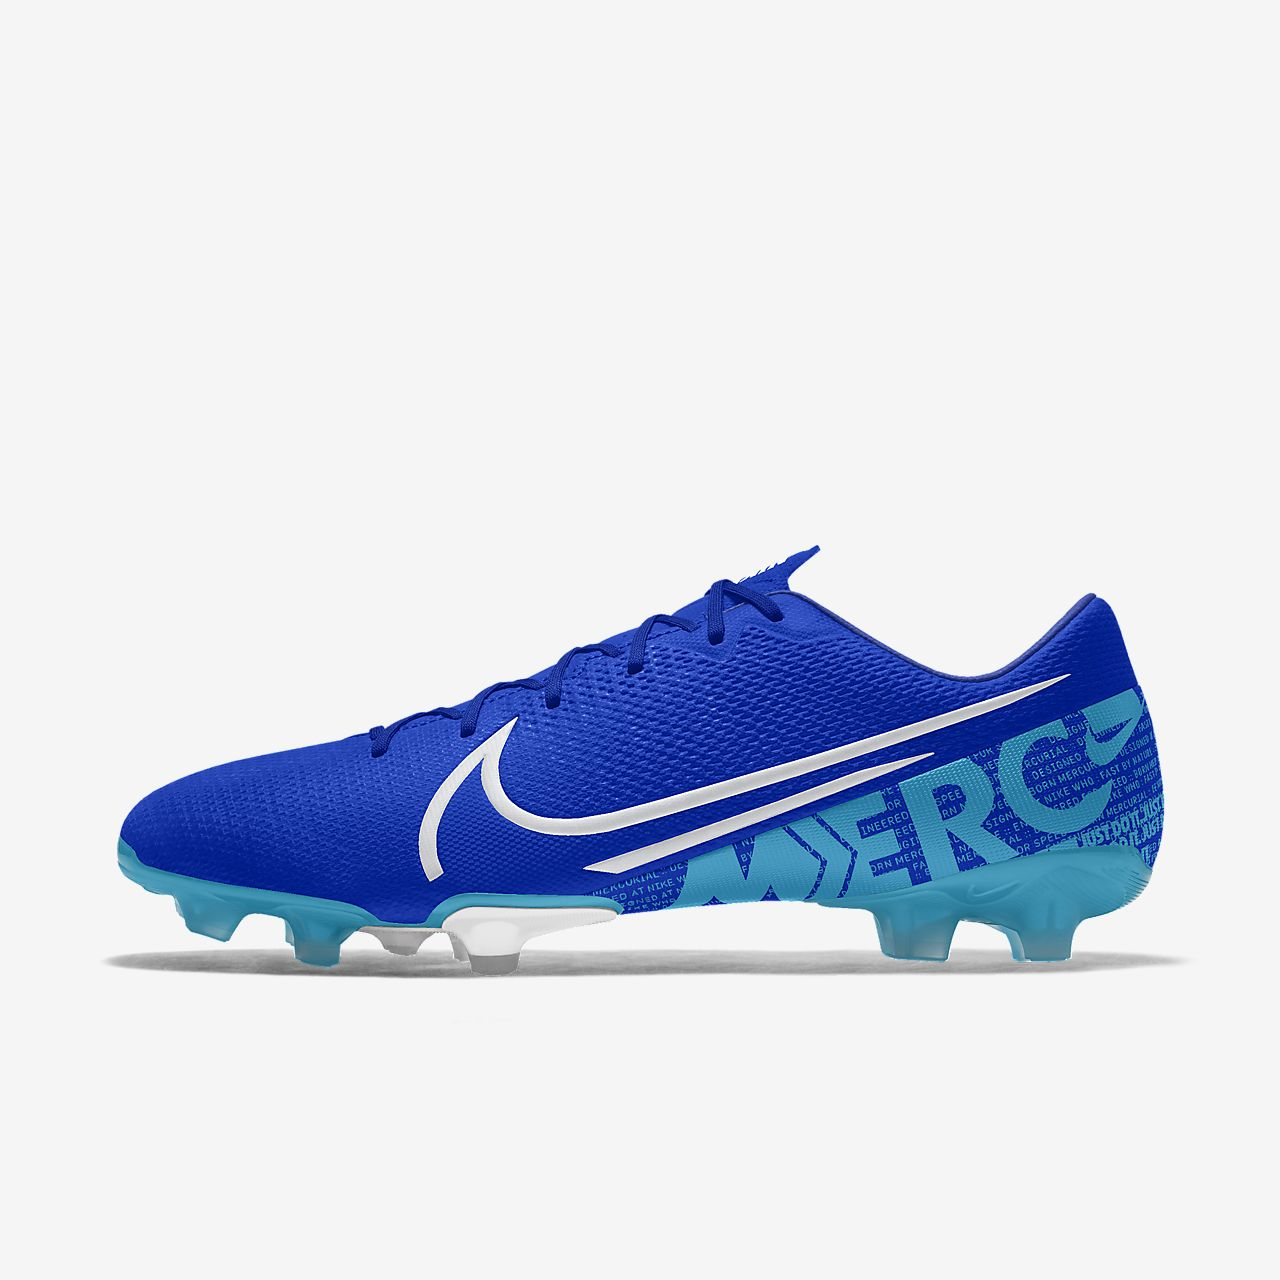 Nike Mercurial Vapor 13 Academy FG By You Botas de fútbol para terreno firme personalizables